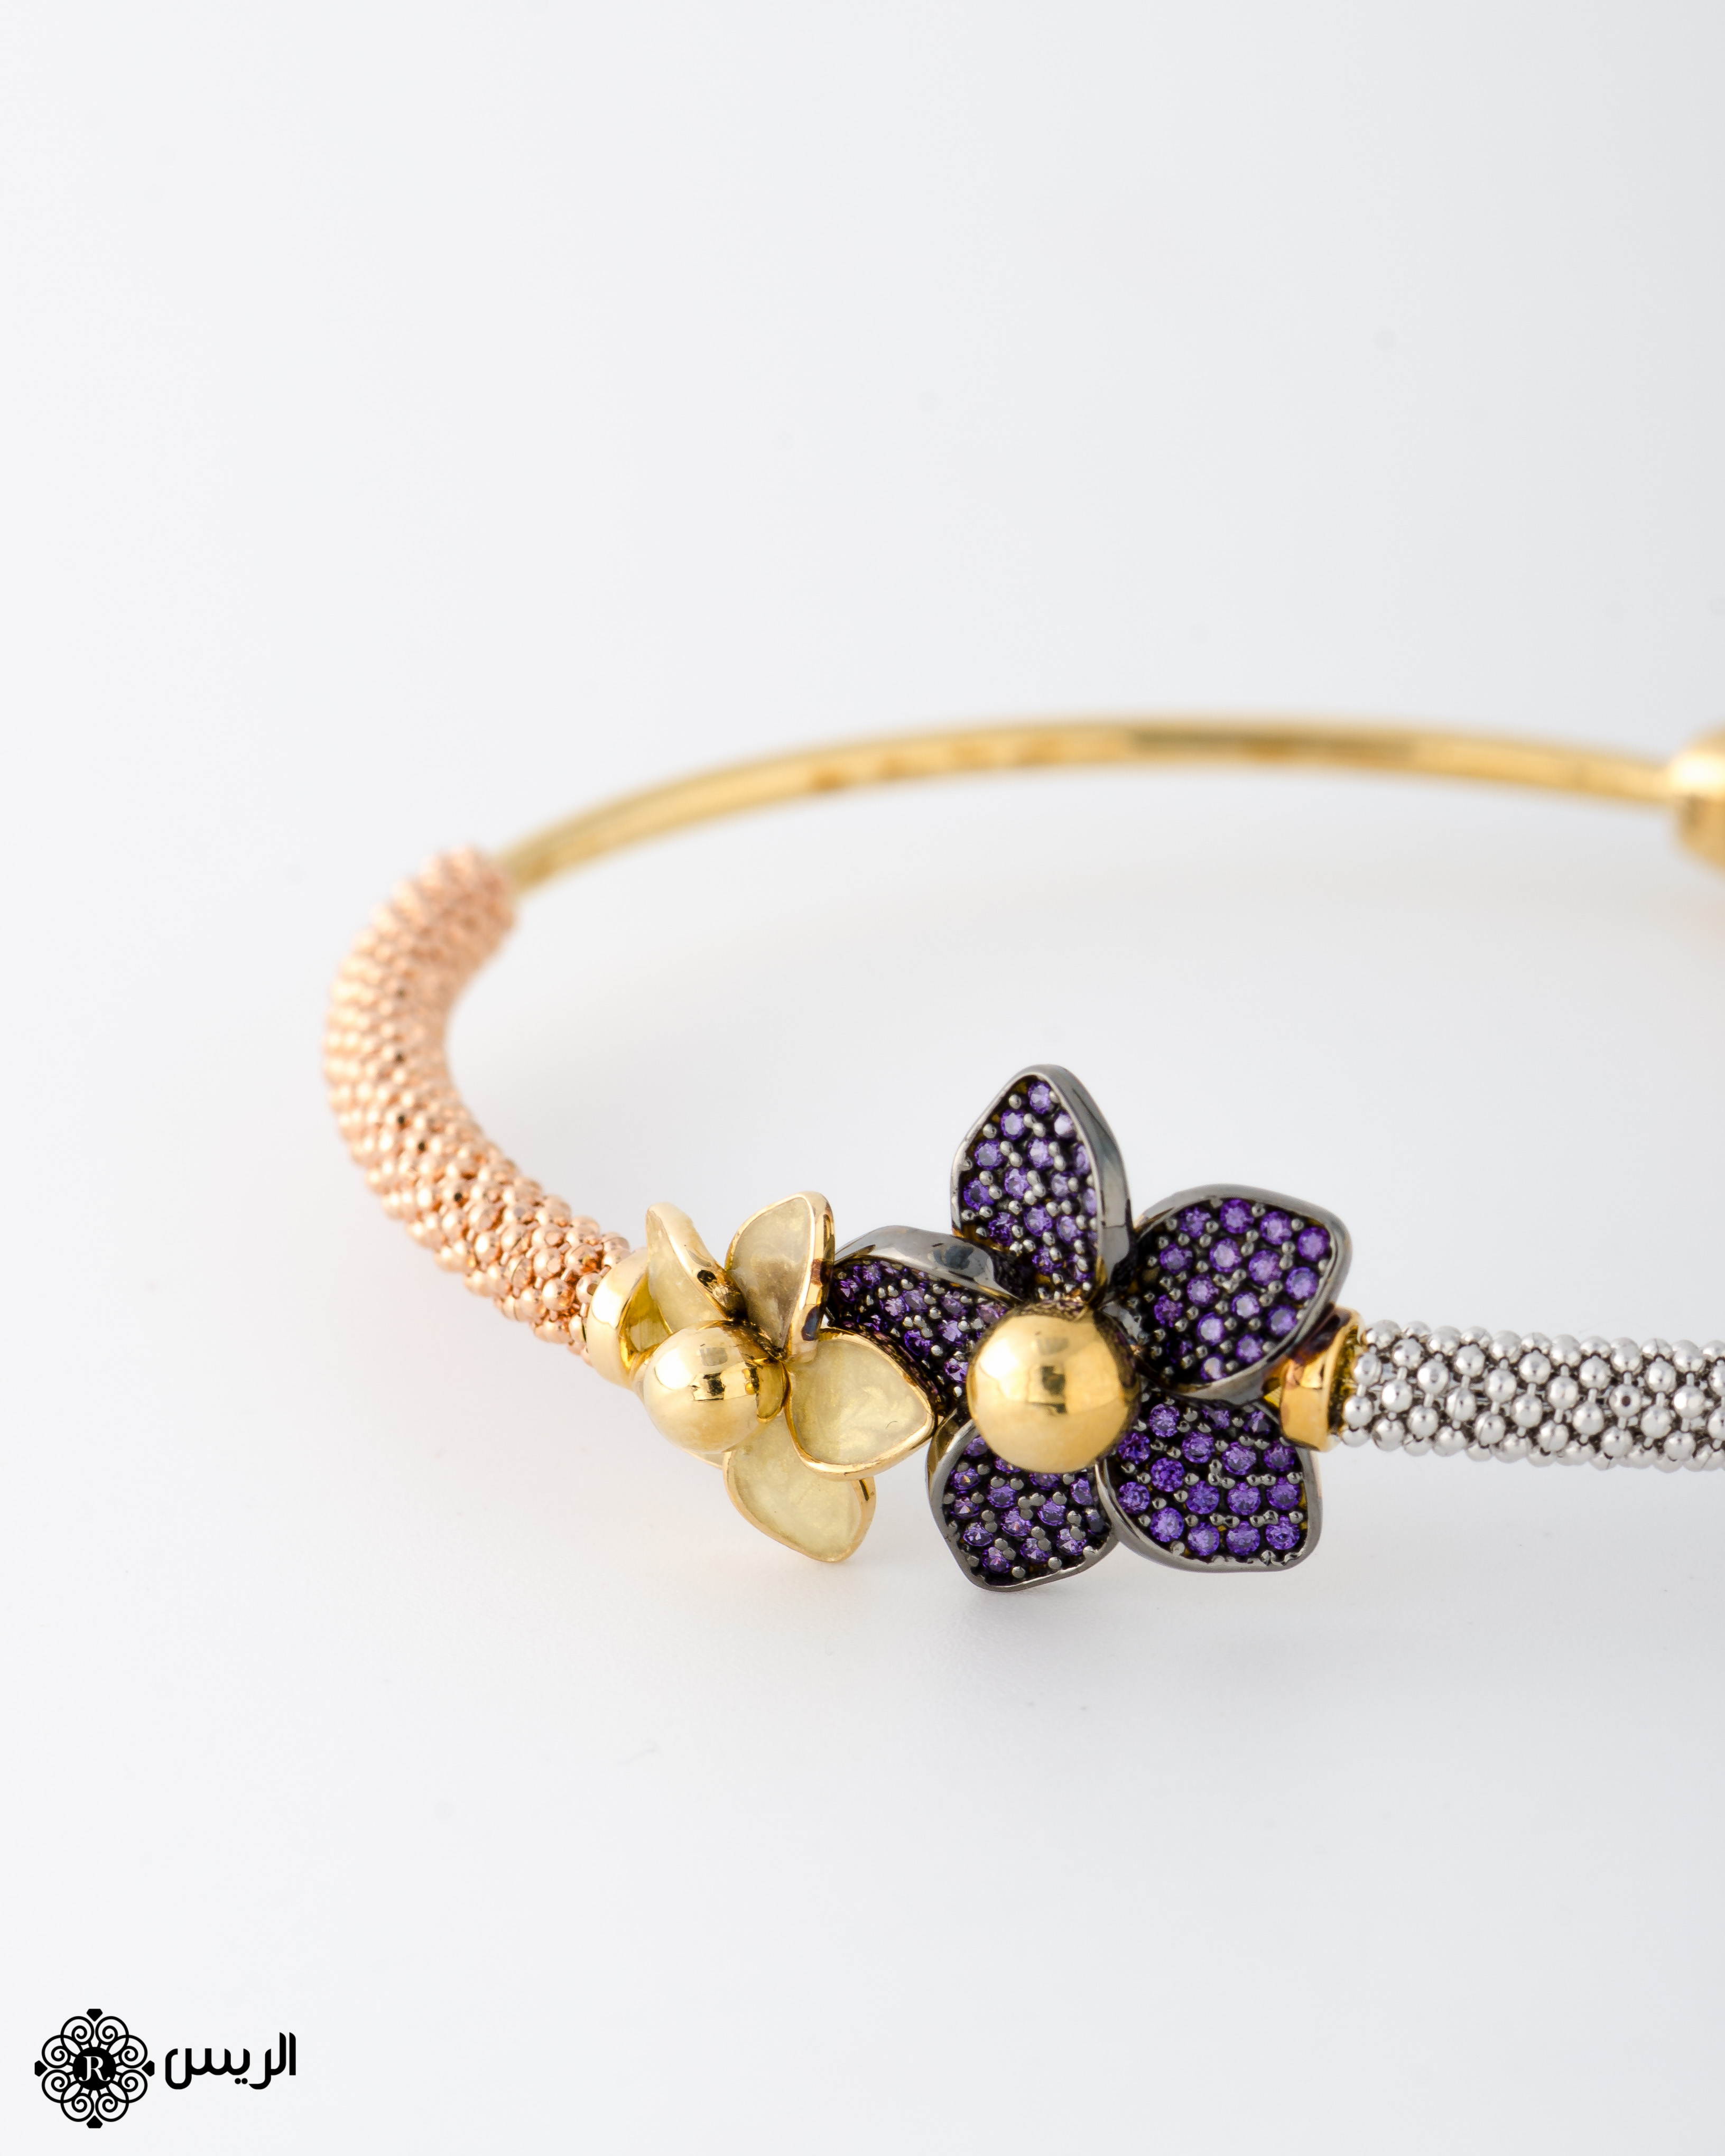 Raies jewelry Bangle Jessica Italian Design with two flowers إسورة جيسيكا تصميم إيطالي وردتين الريس للمجوهرات